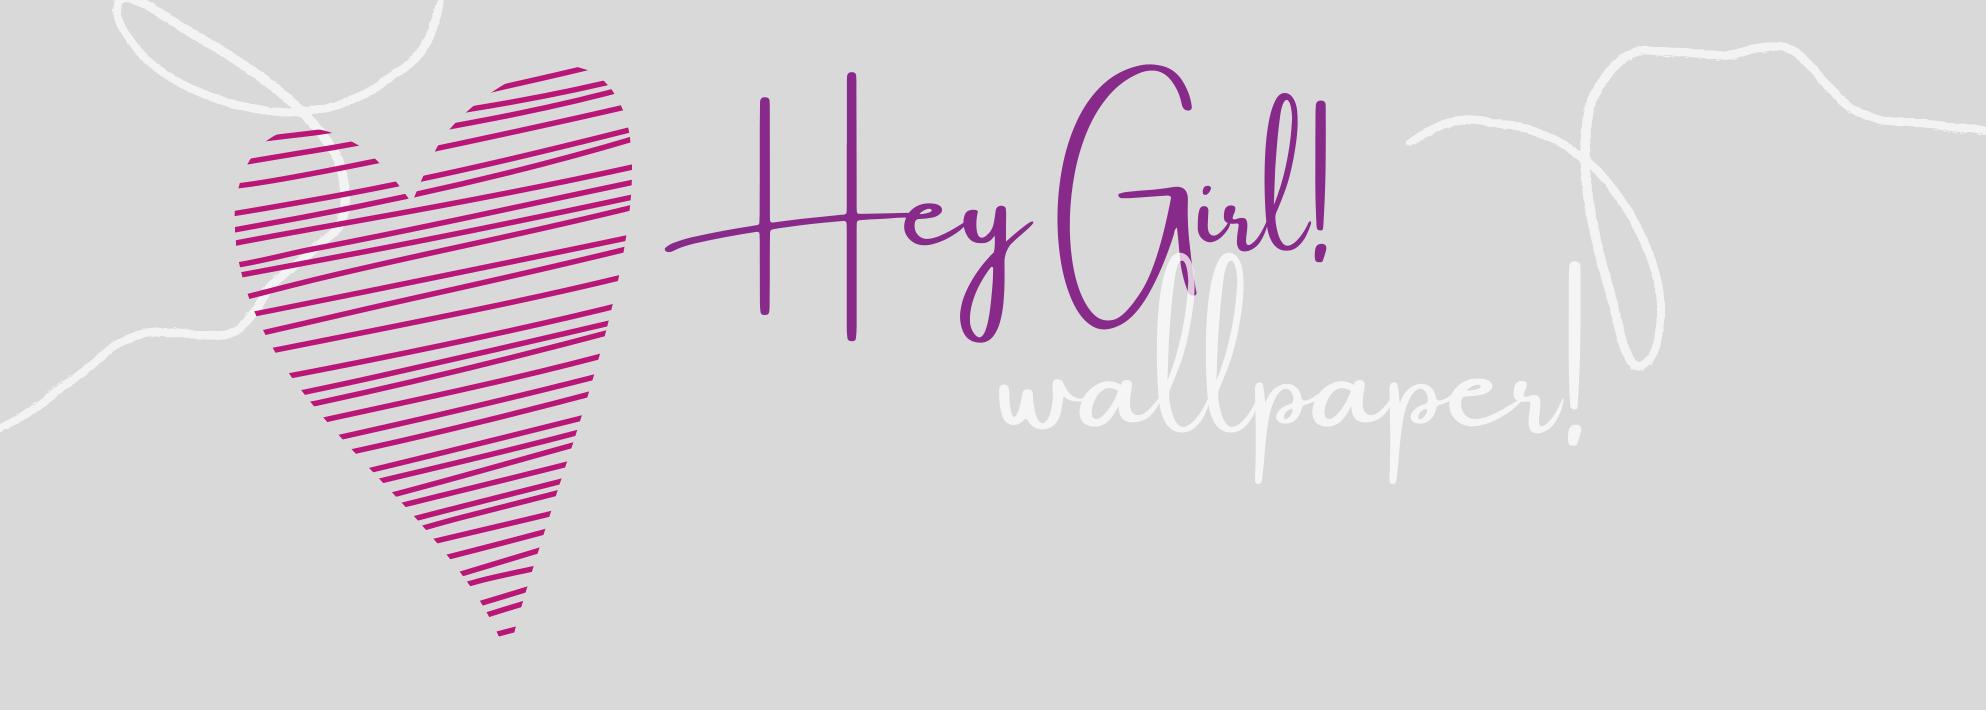 Hey Girl Wallpaper